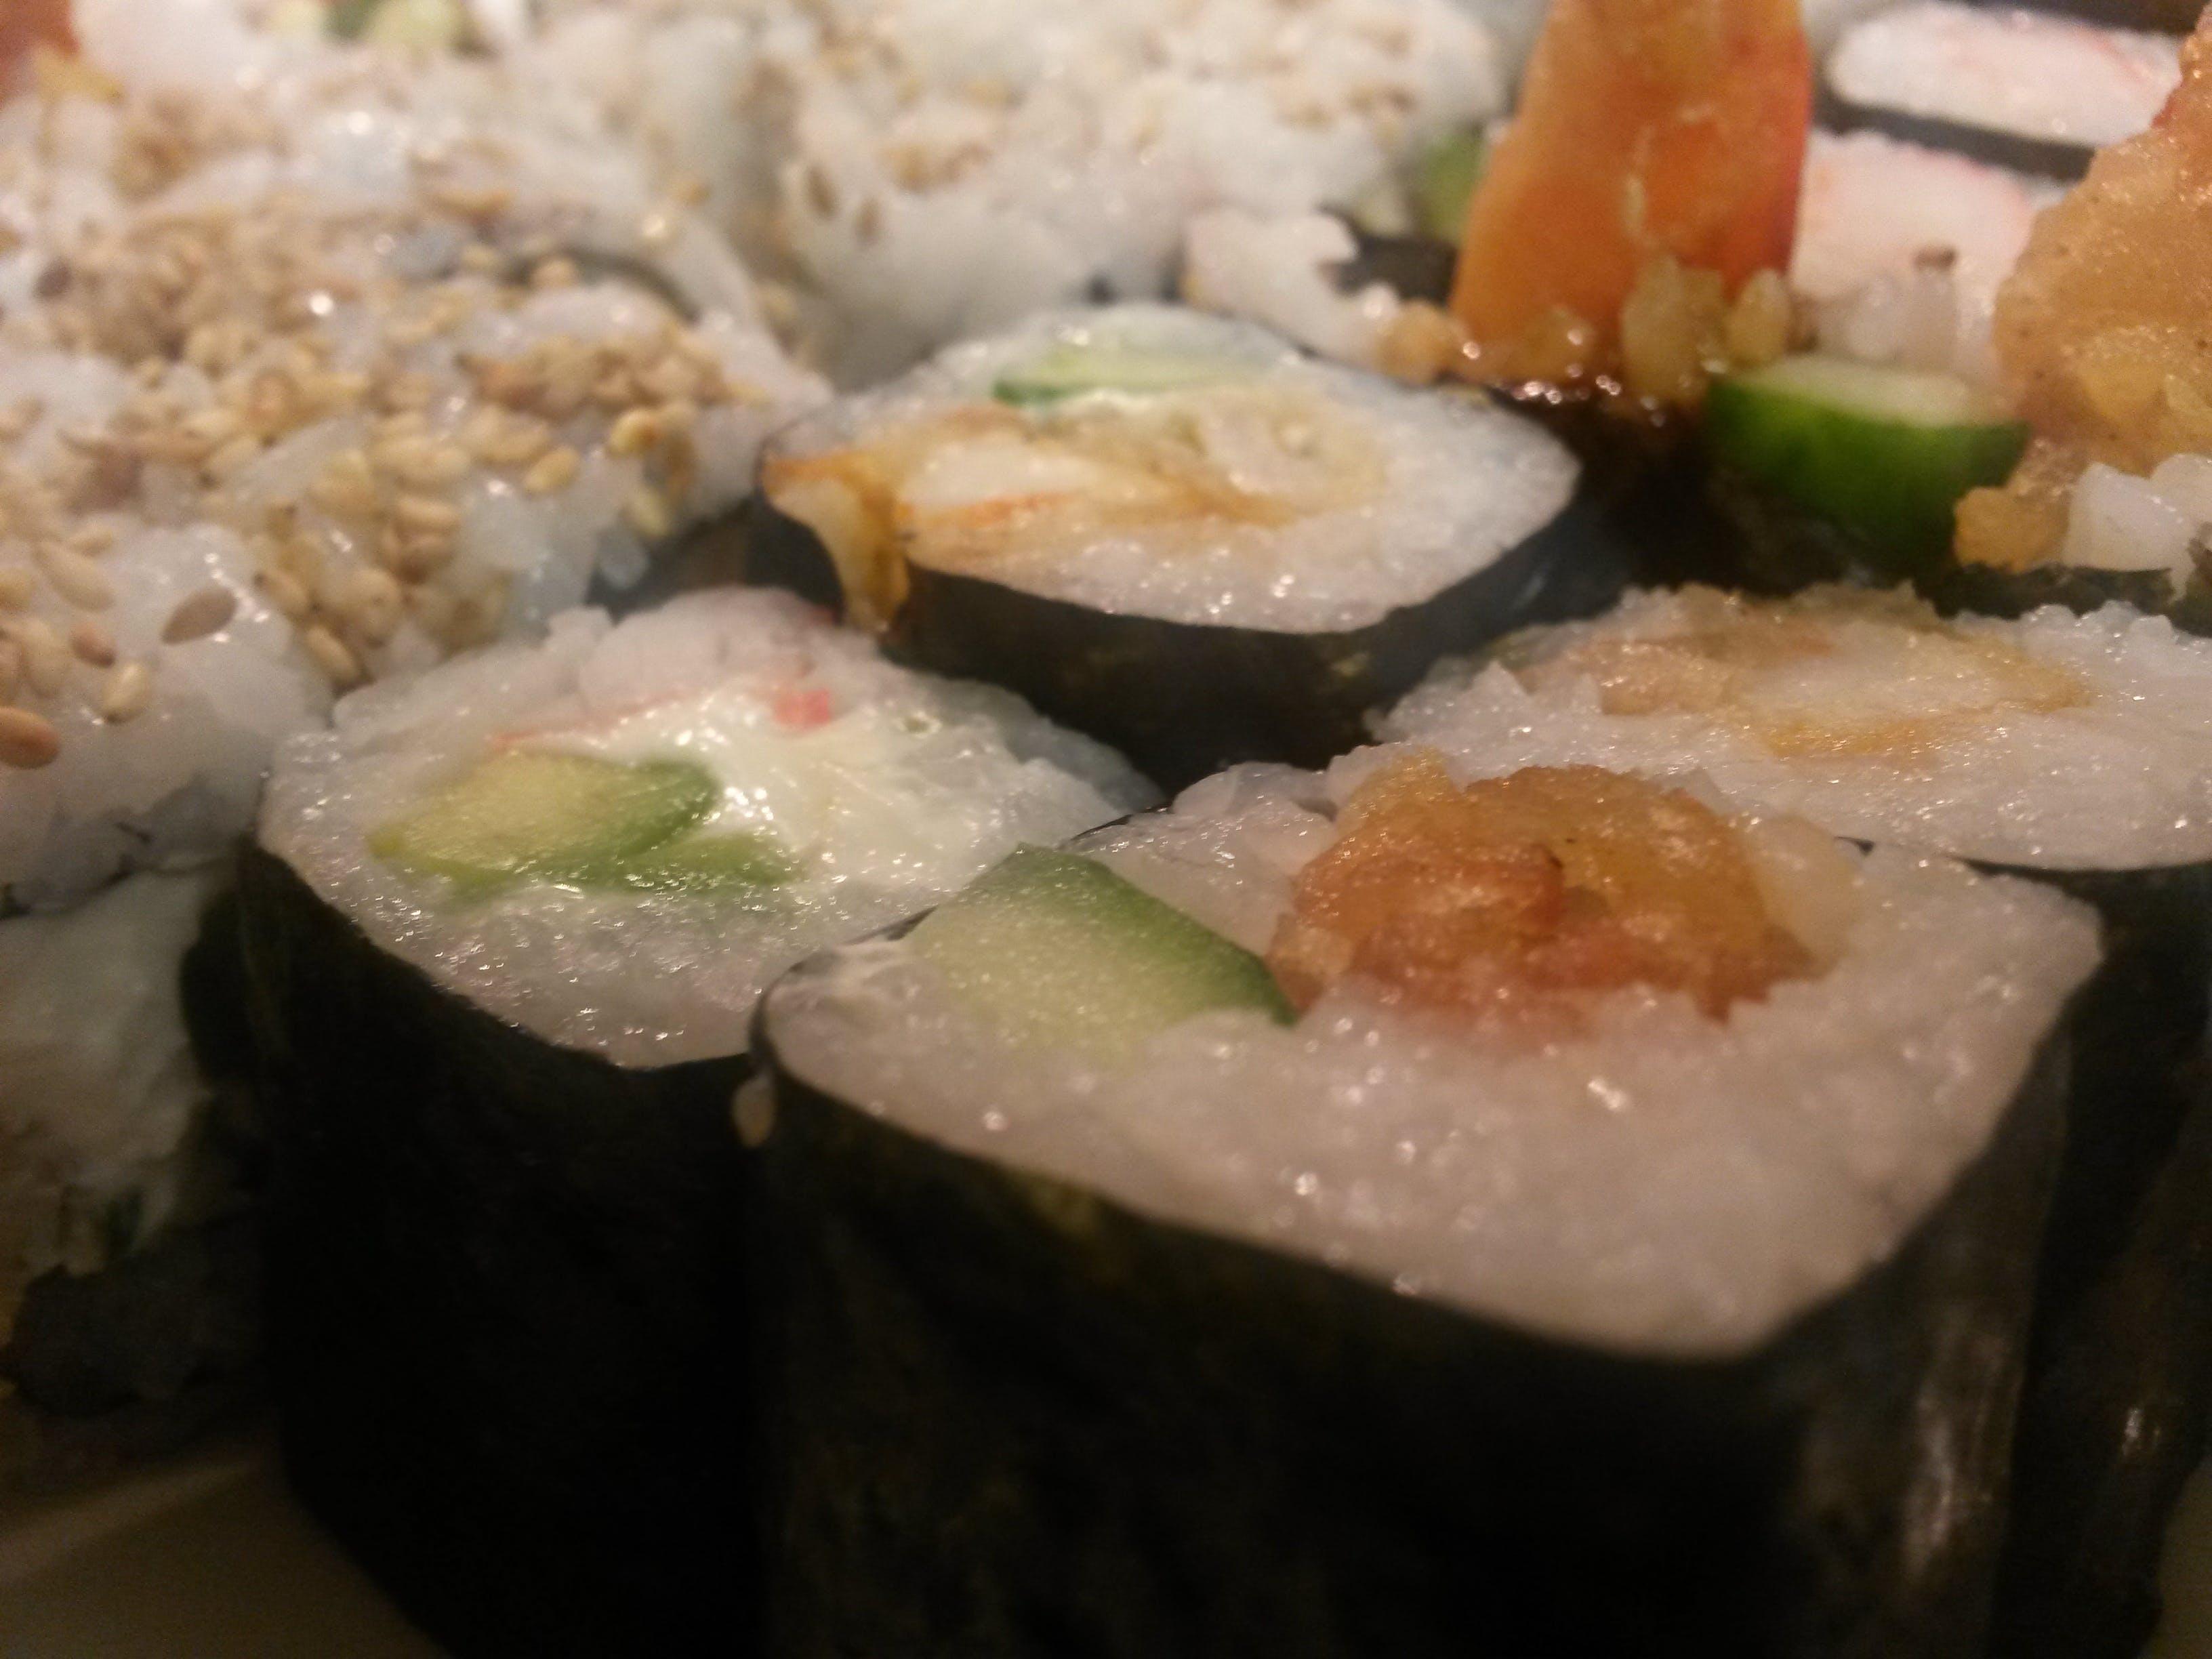 Free stock photo of sushi, bruder kann-sushi-machen